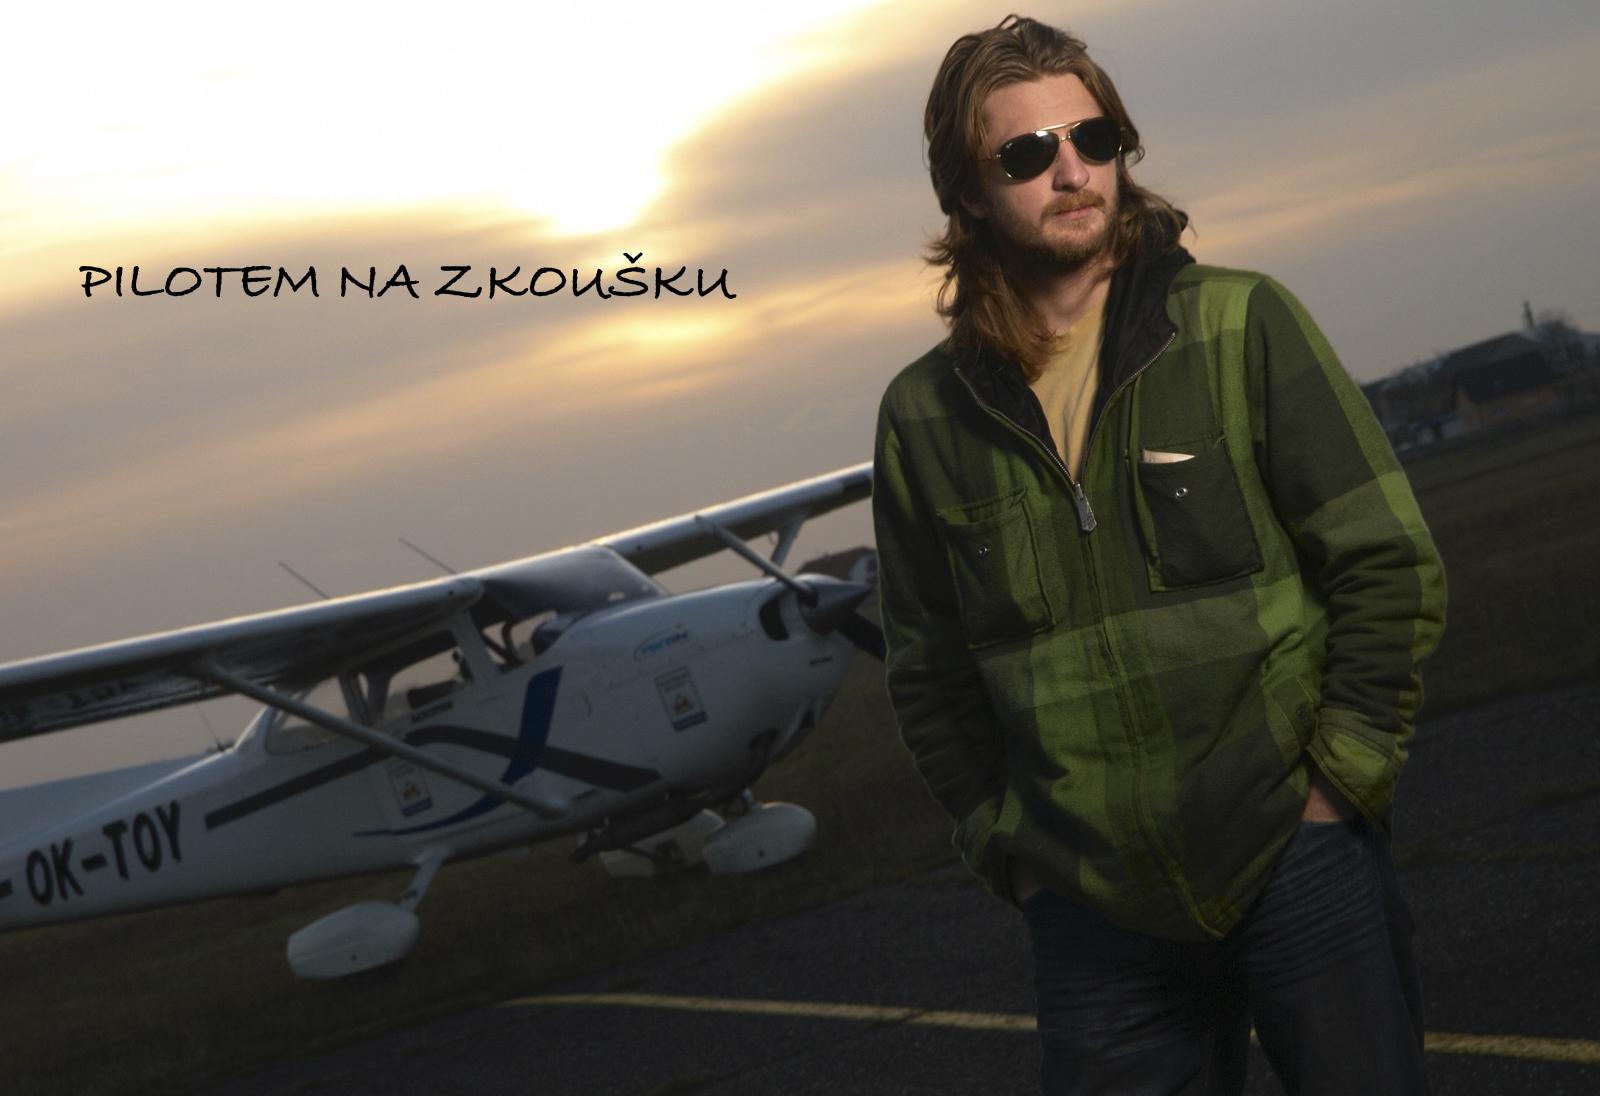 Ruda / Olympus E-3 / Trnka 2009